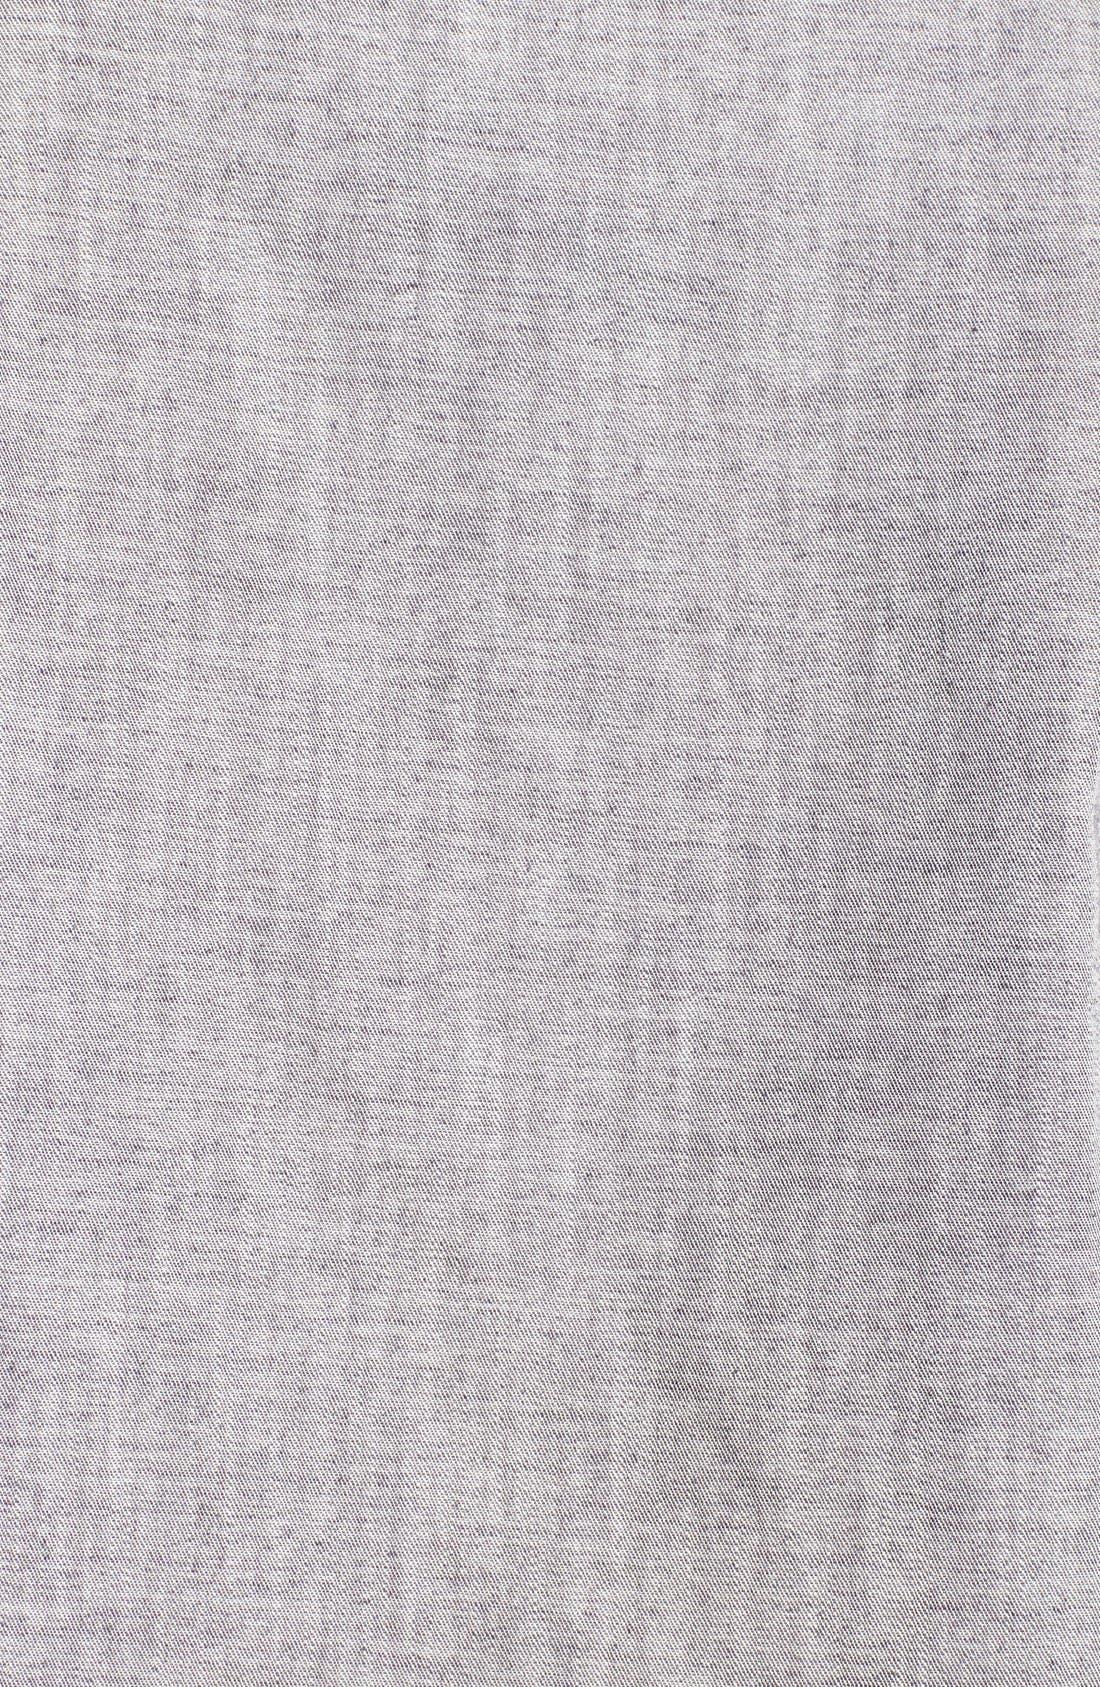 Alternate Image 3  - Current/Elliott 'The Perfect Shirt' Cotton Shirt